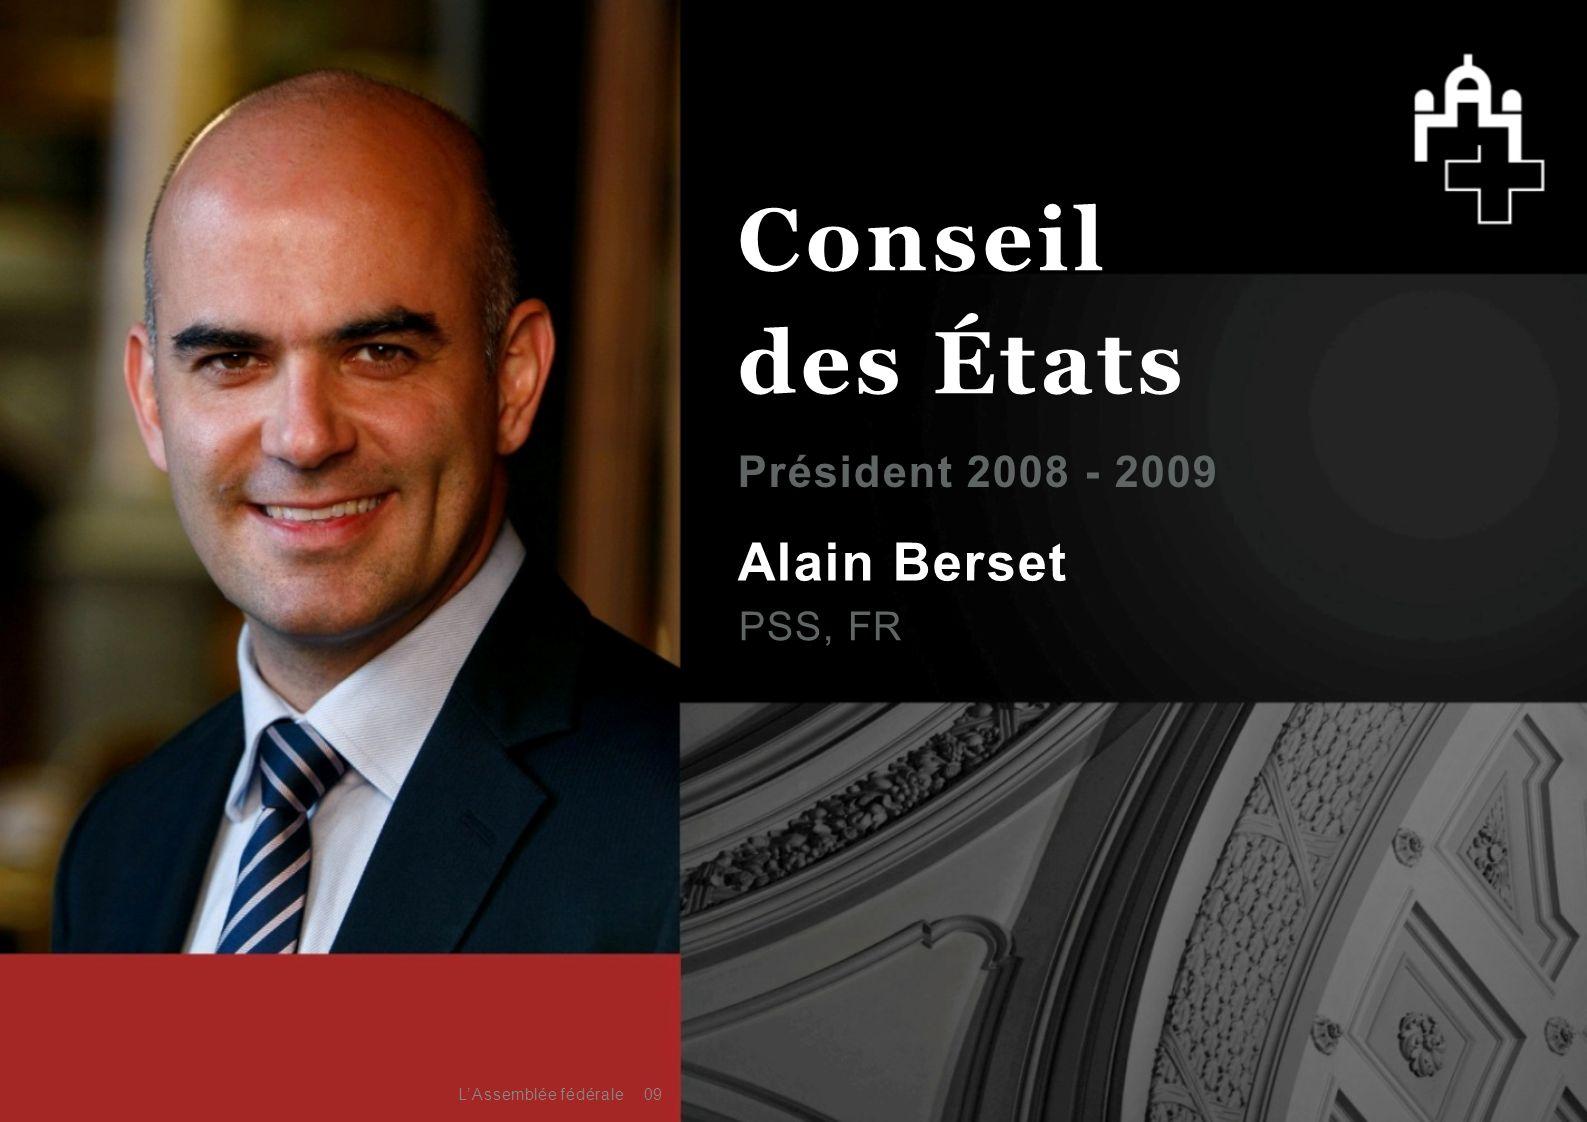 Conseil des États Alain Berset Président 2008 - 2009 PSS, FR